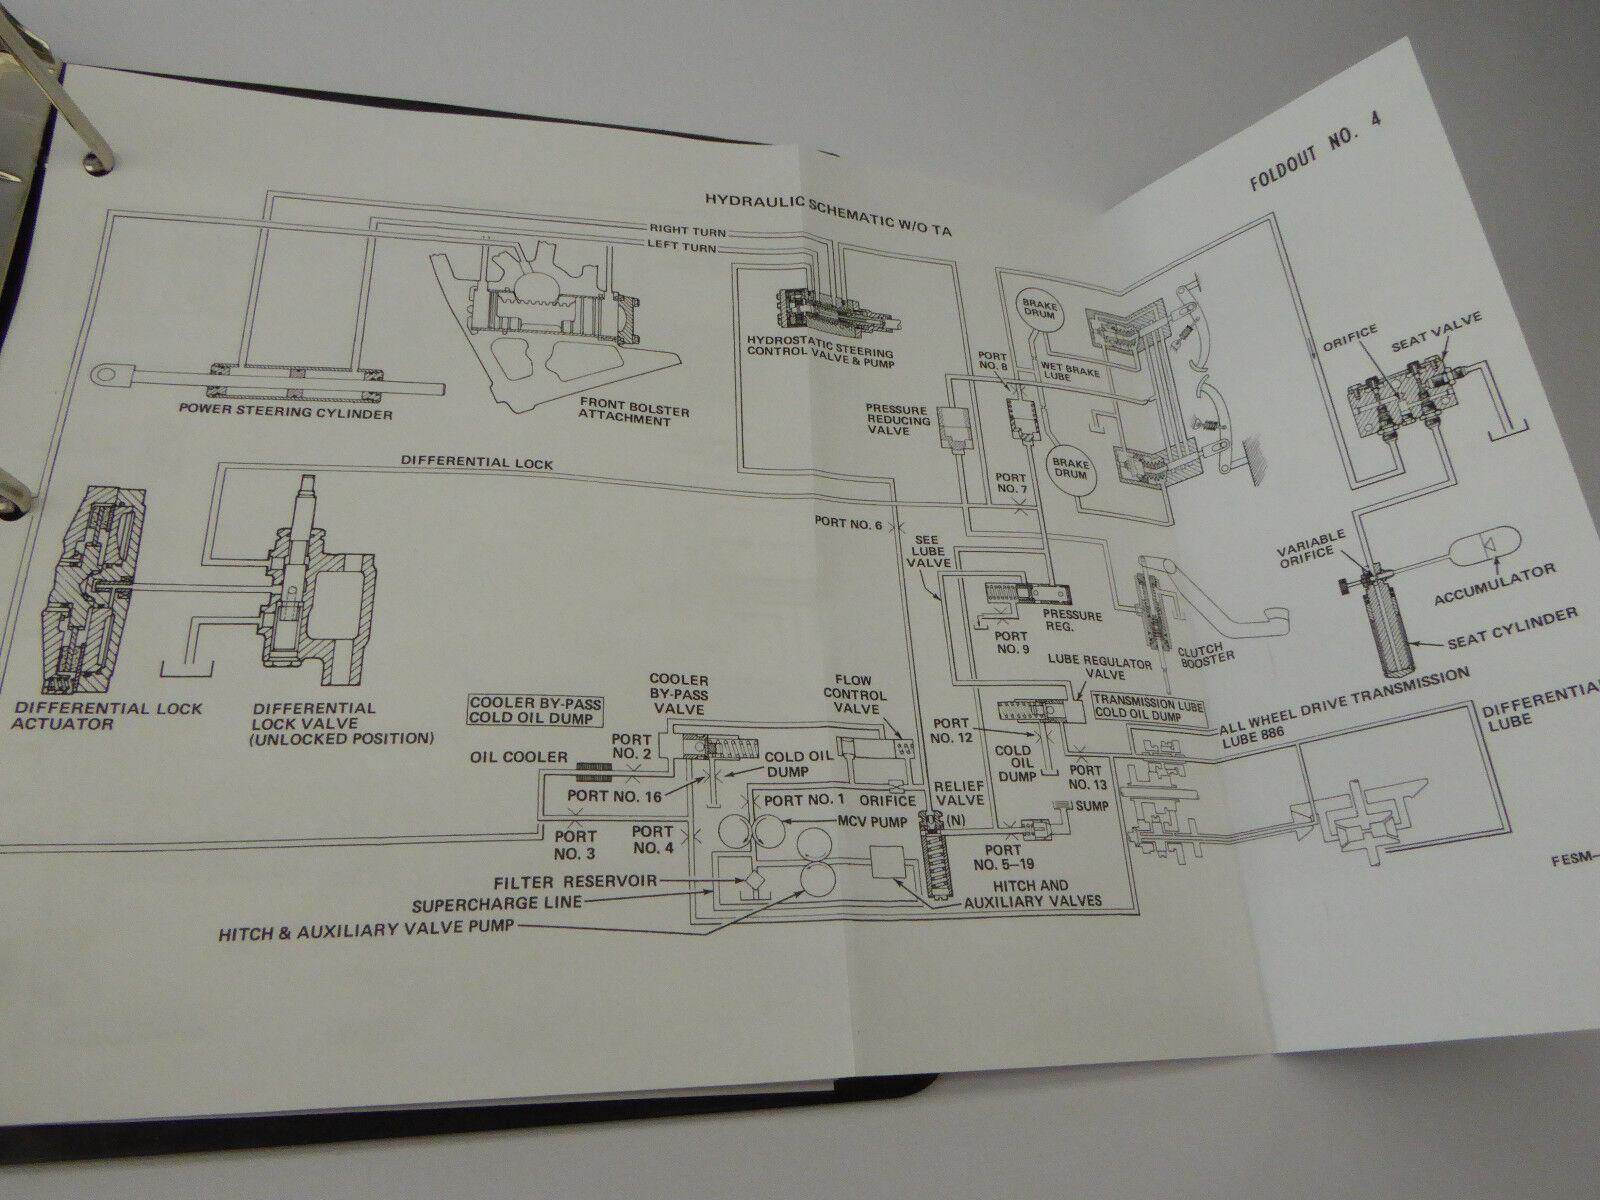 International Ih 786 886 986 1086 1486 1586 Hydro 186 Tractor Cab Wiring Diagram 8 Of 9